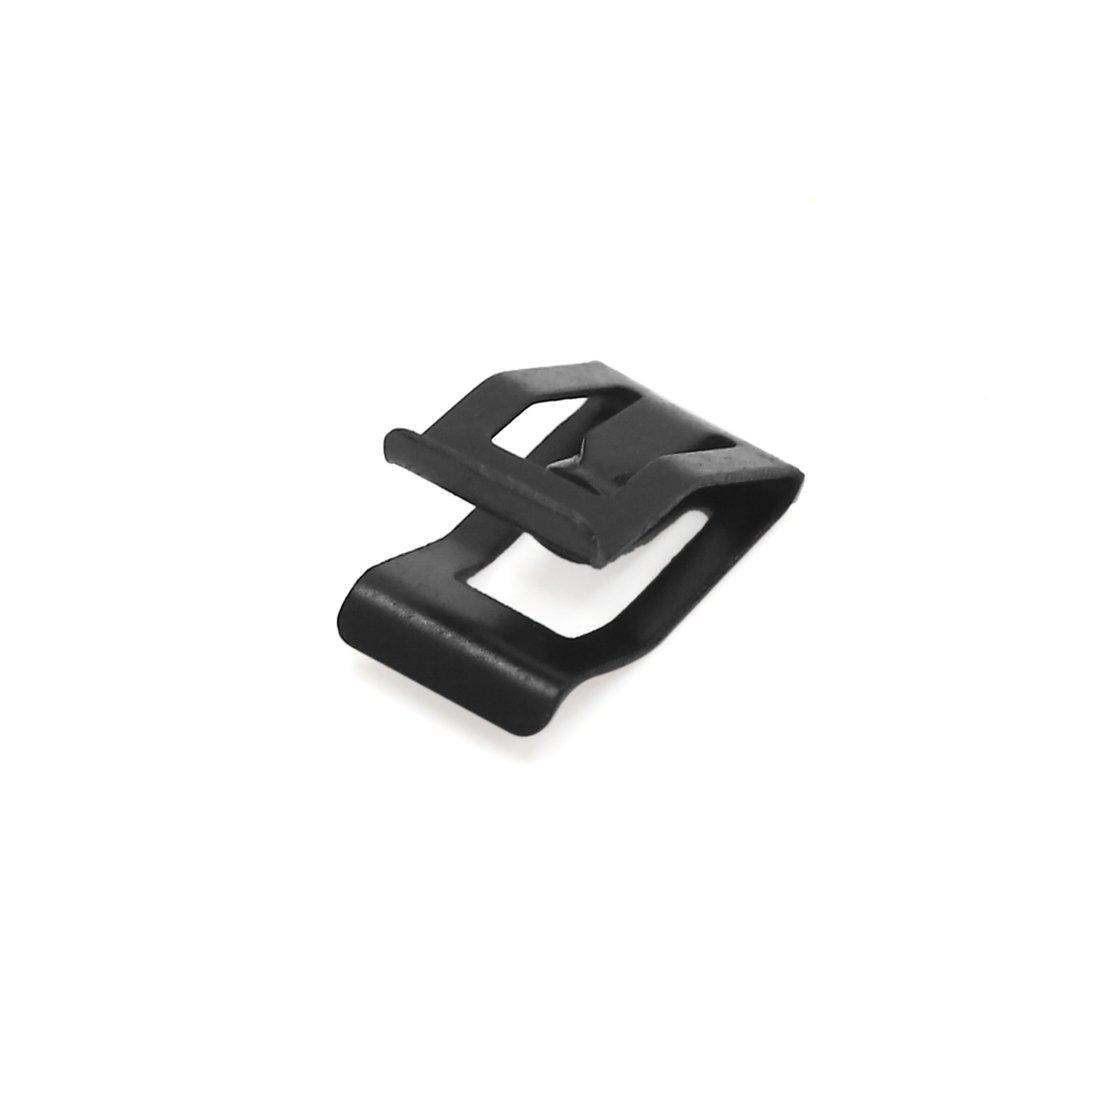 sourcing map 20pcs Rivet Clip Holding Black Metal Car Dashboard Console Dashboard